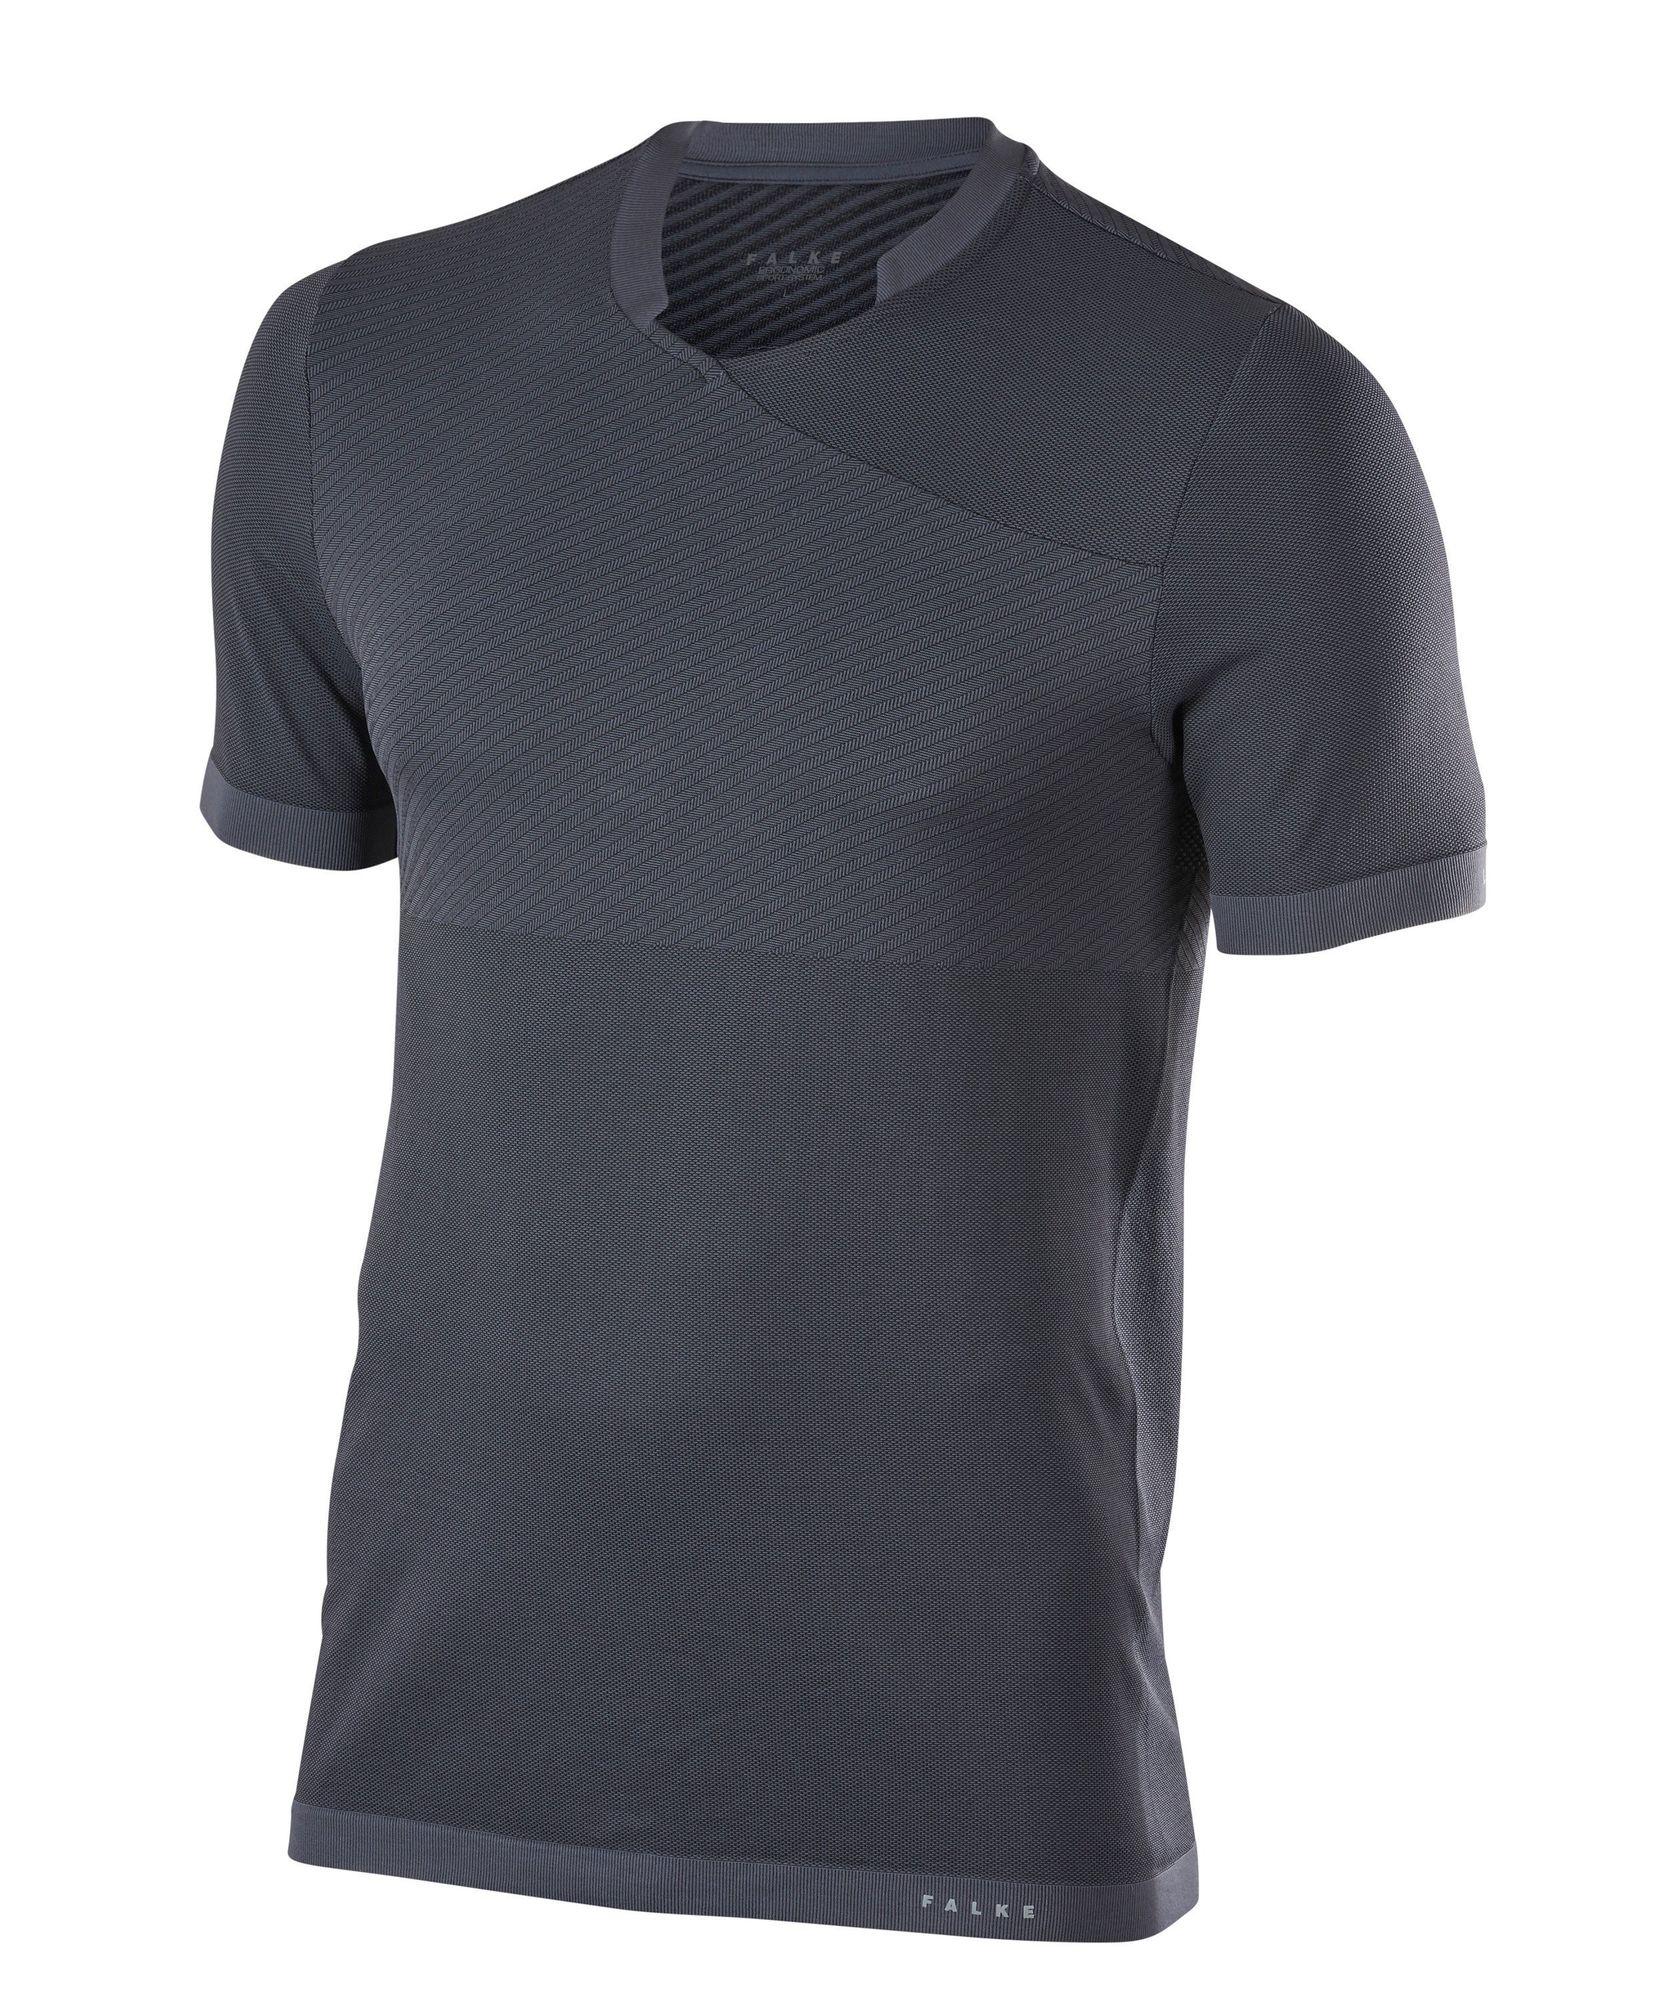 Falke Fitness T-Shirt in Dunkelgrau